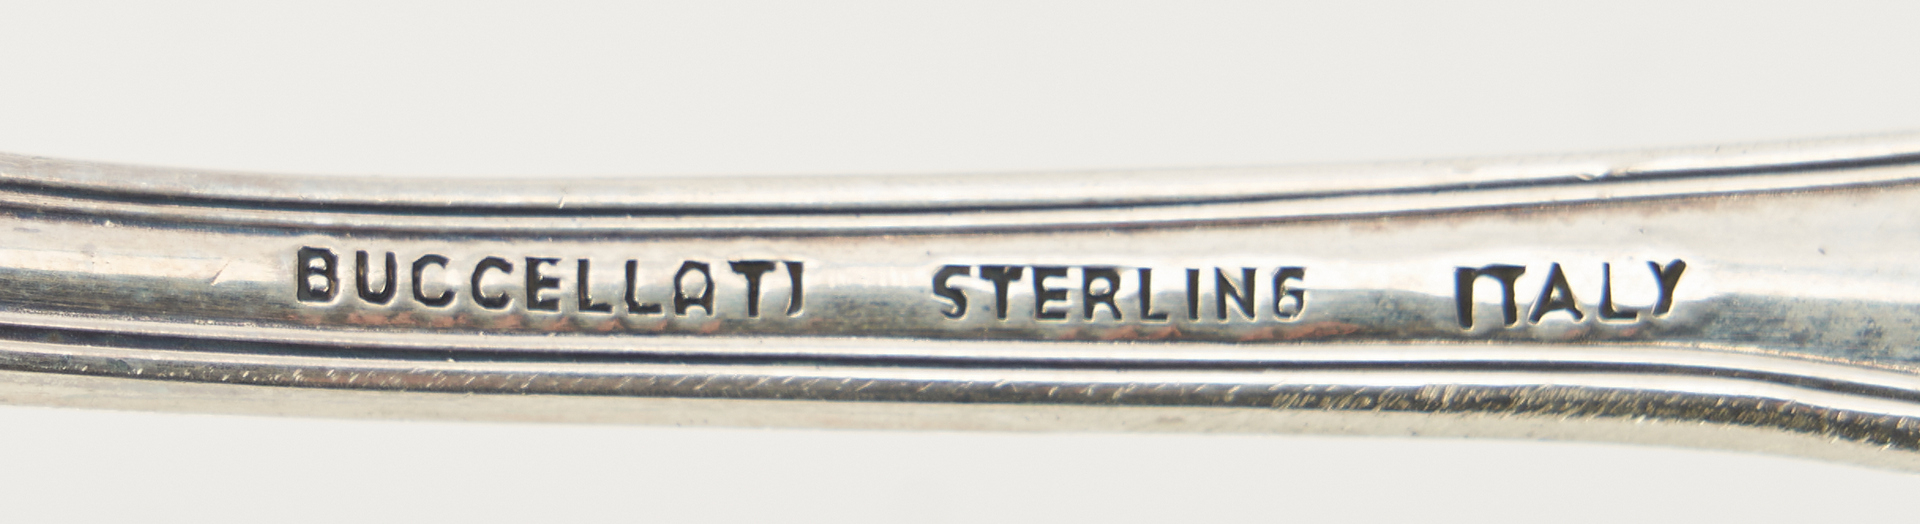 Lot 59: 84 Pcs. Buccellati Empire Sterling Flatware